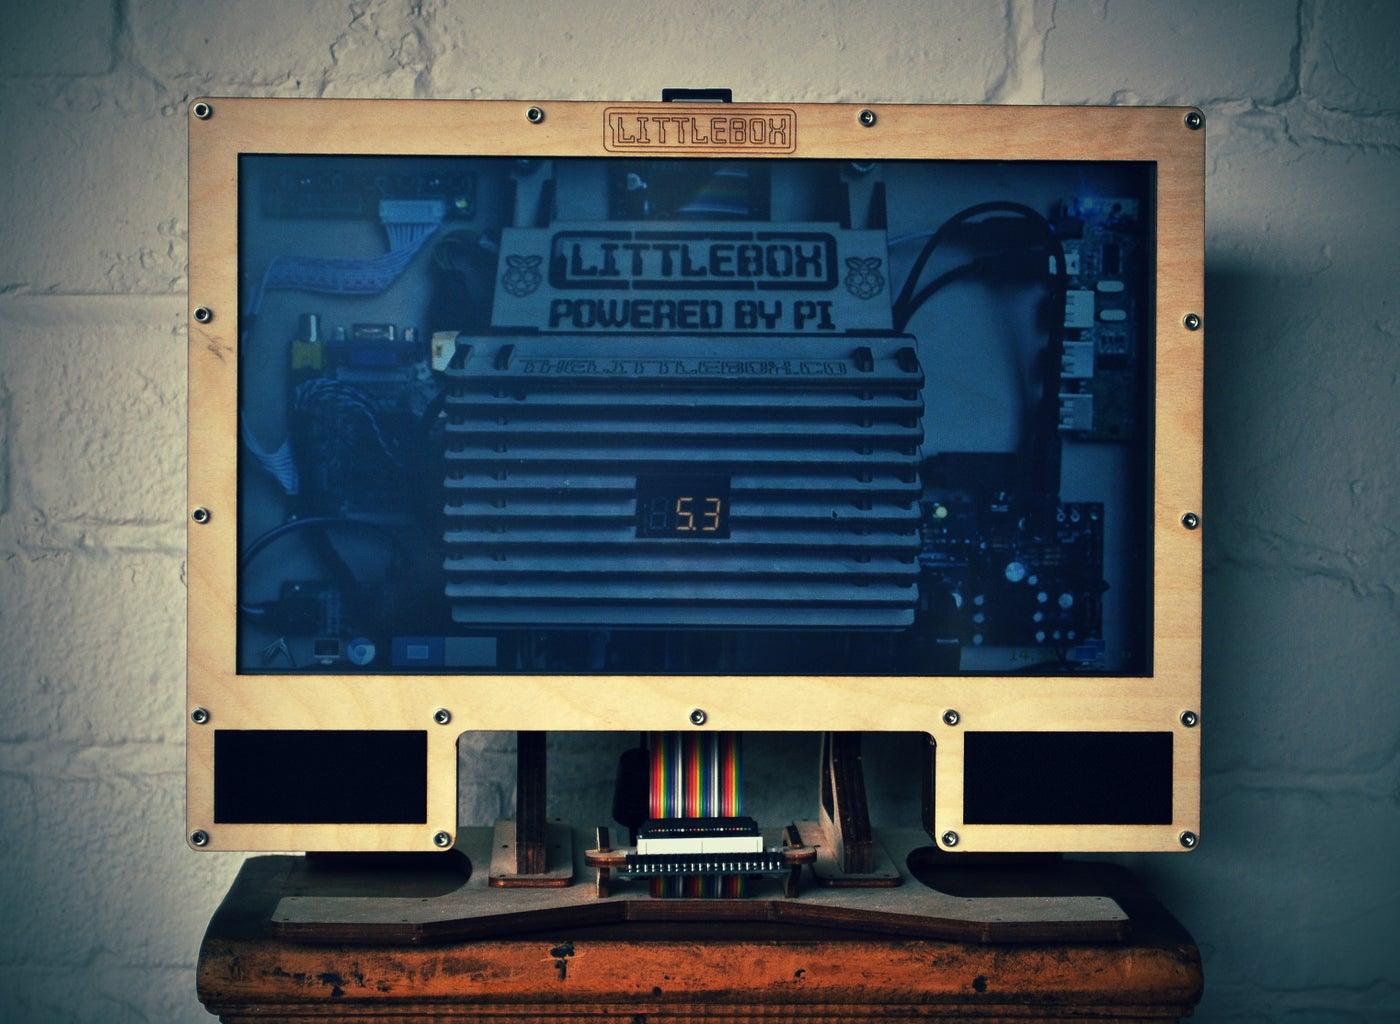 The LittleBox   a Raspberry Pi PC